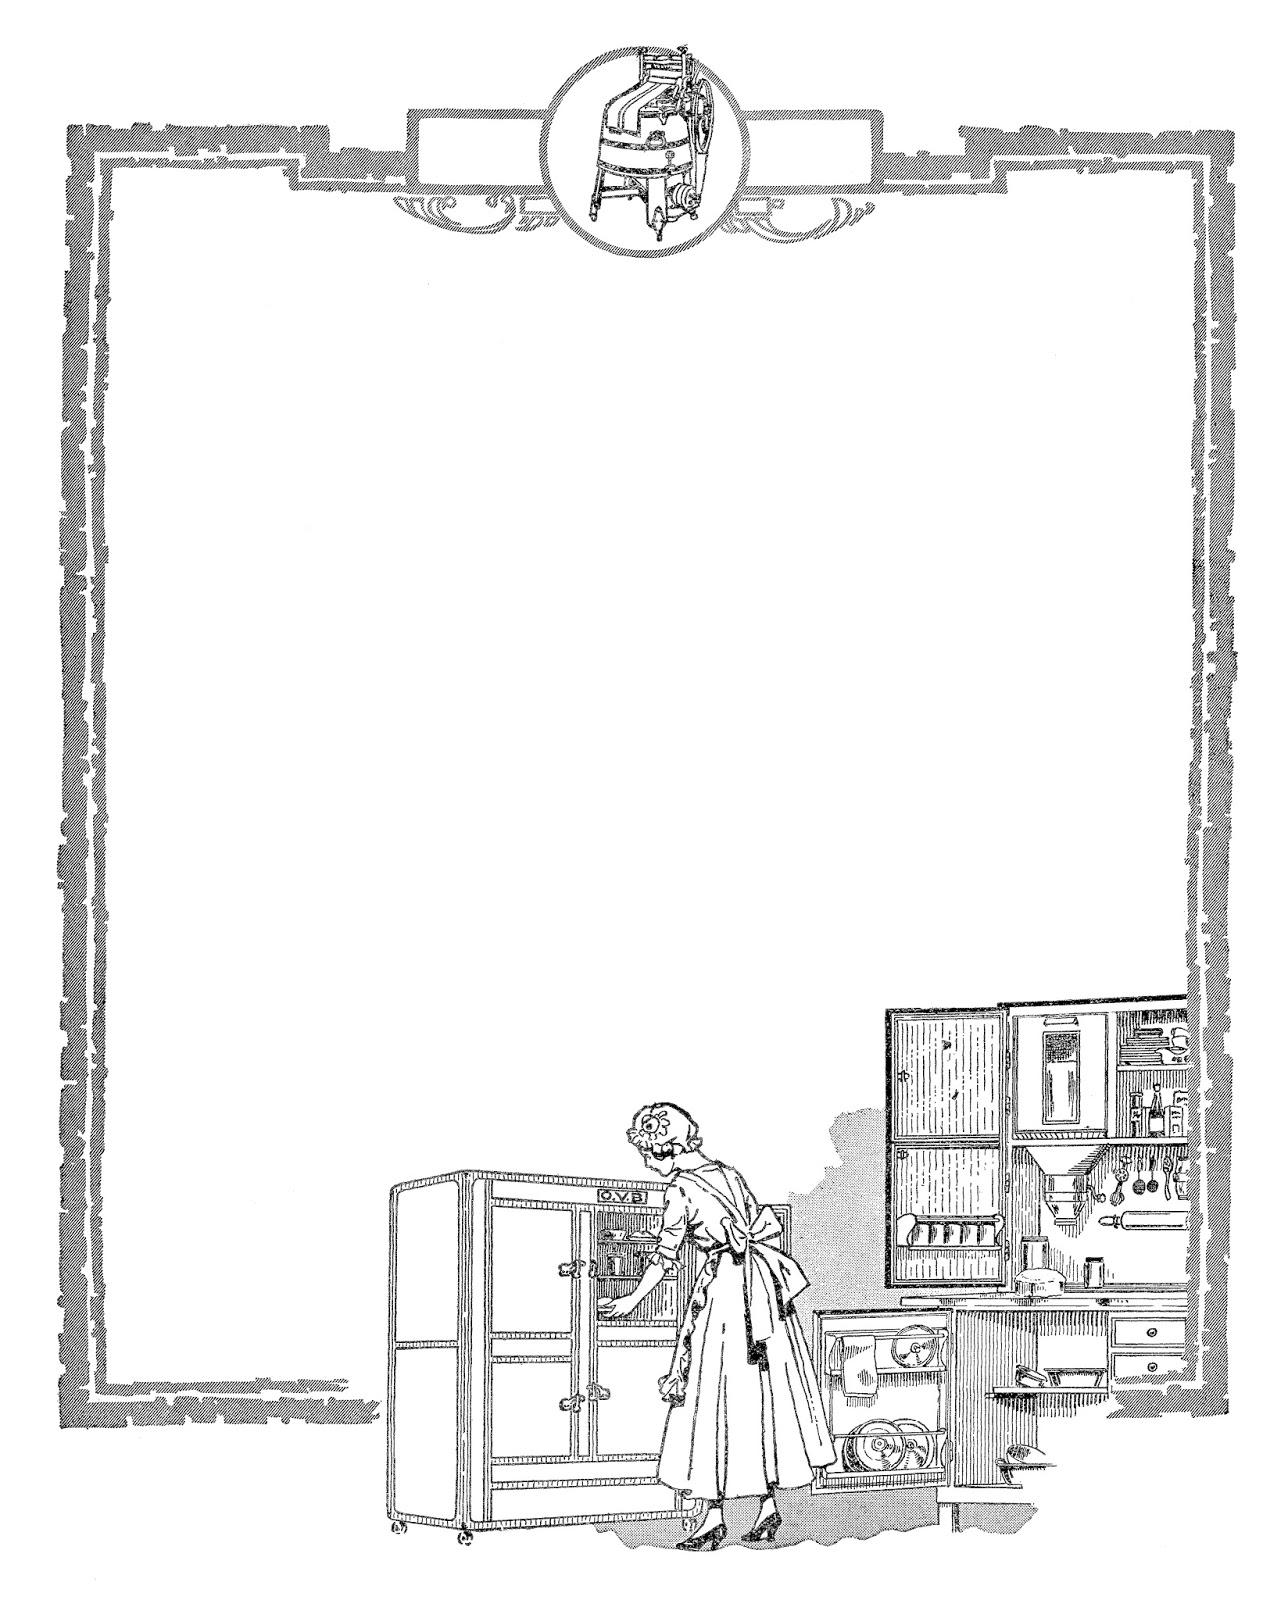 Kitchen Pictures Frames: Antique Images: Scrapbooking Digital Kitchen Download